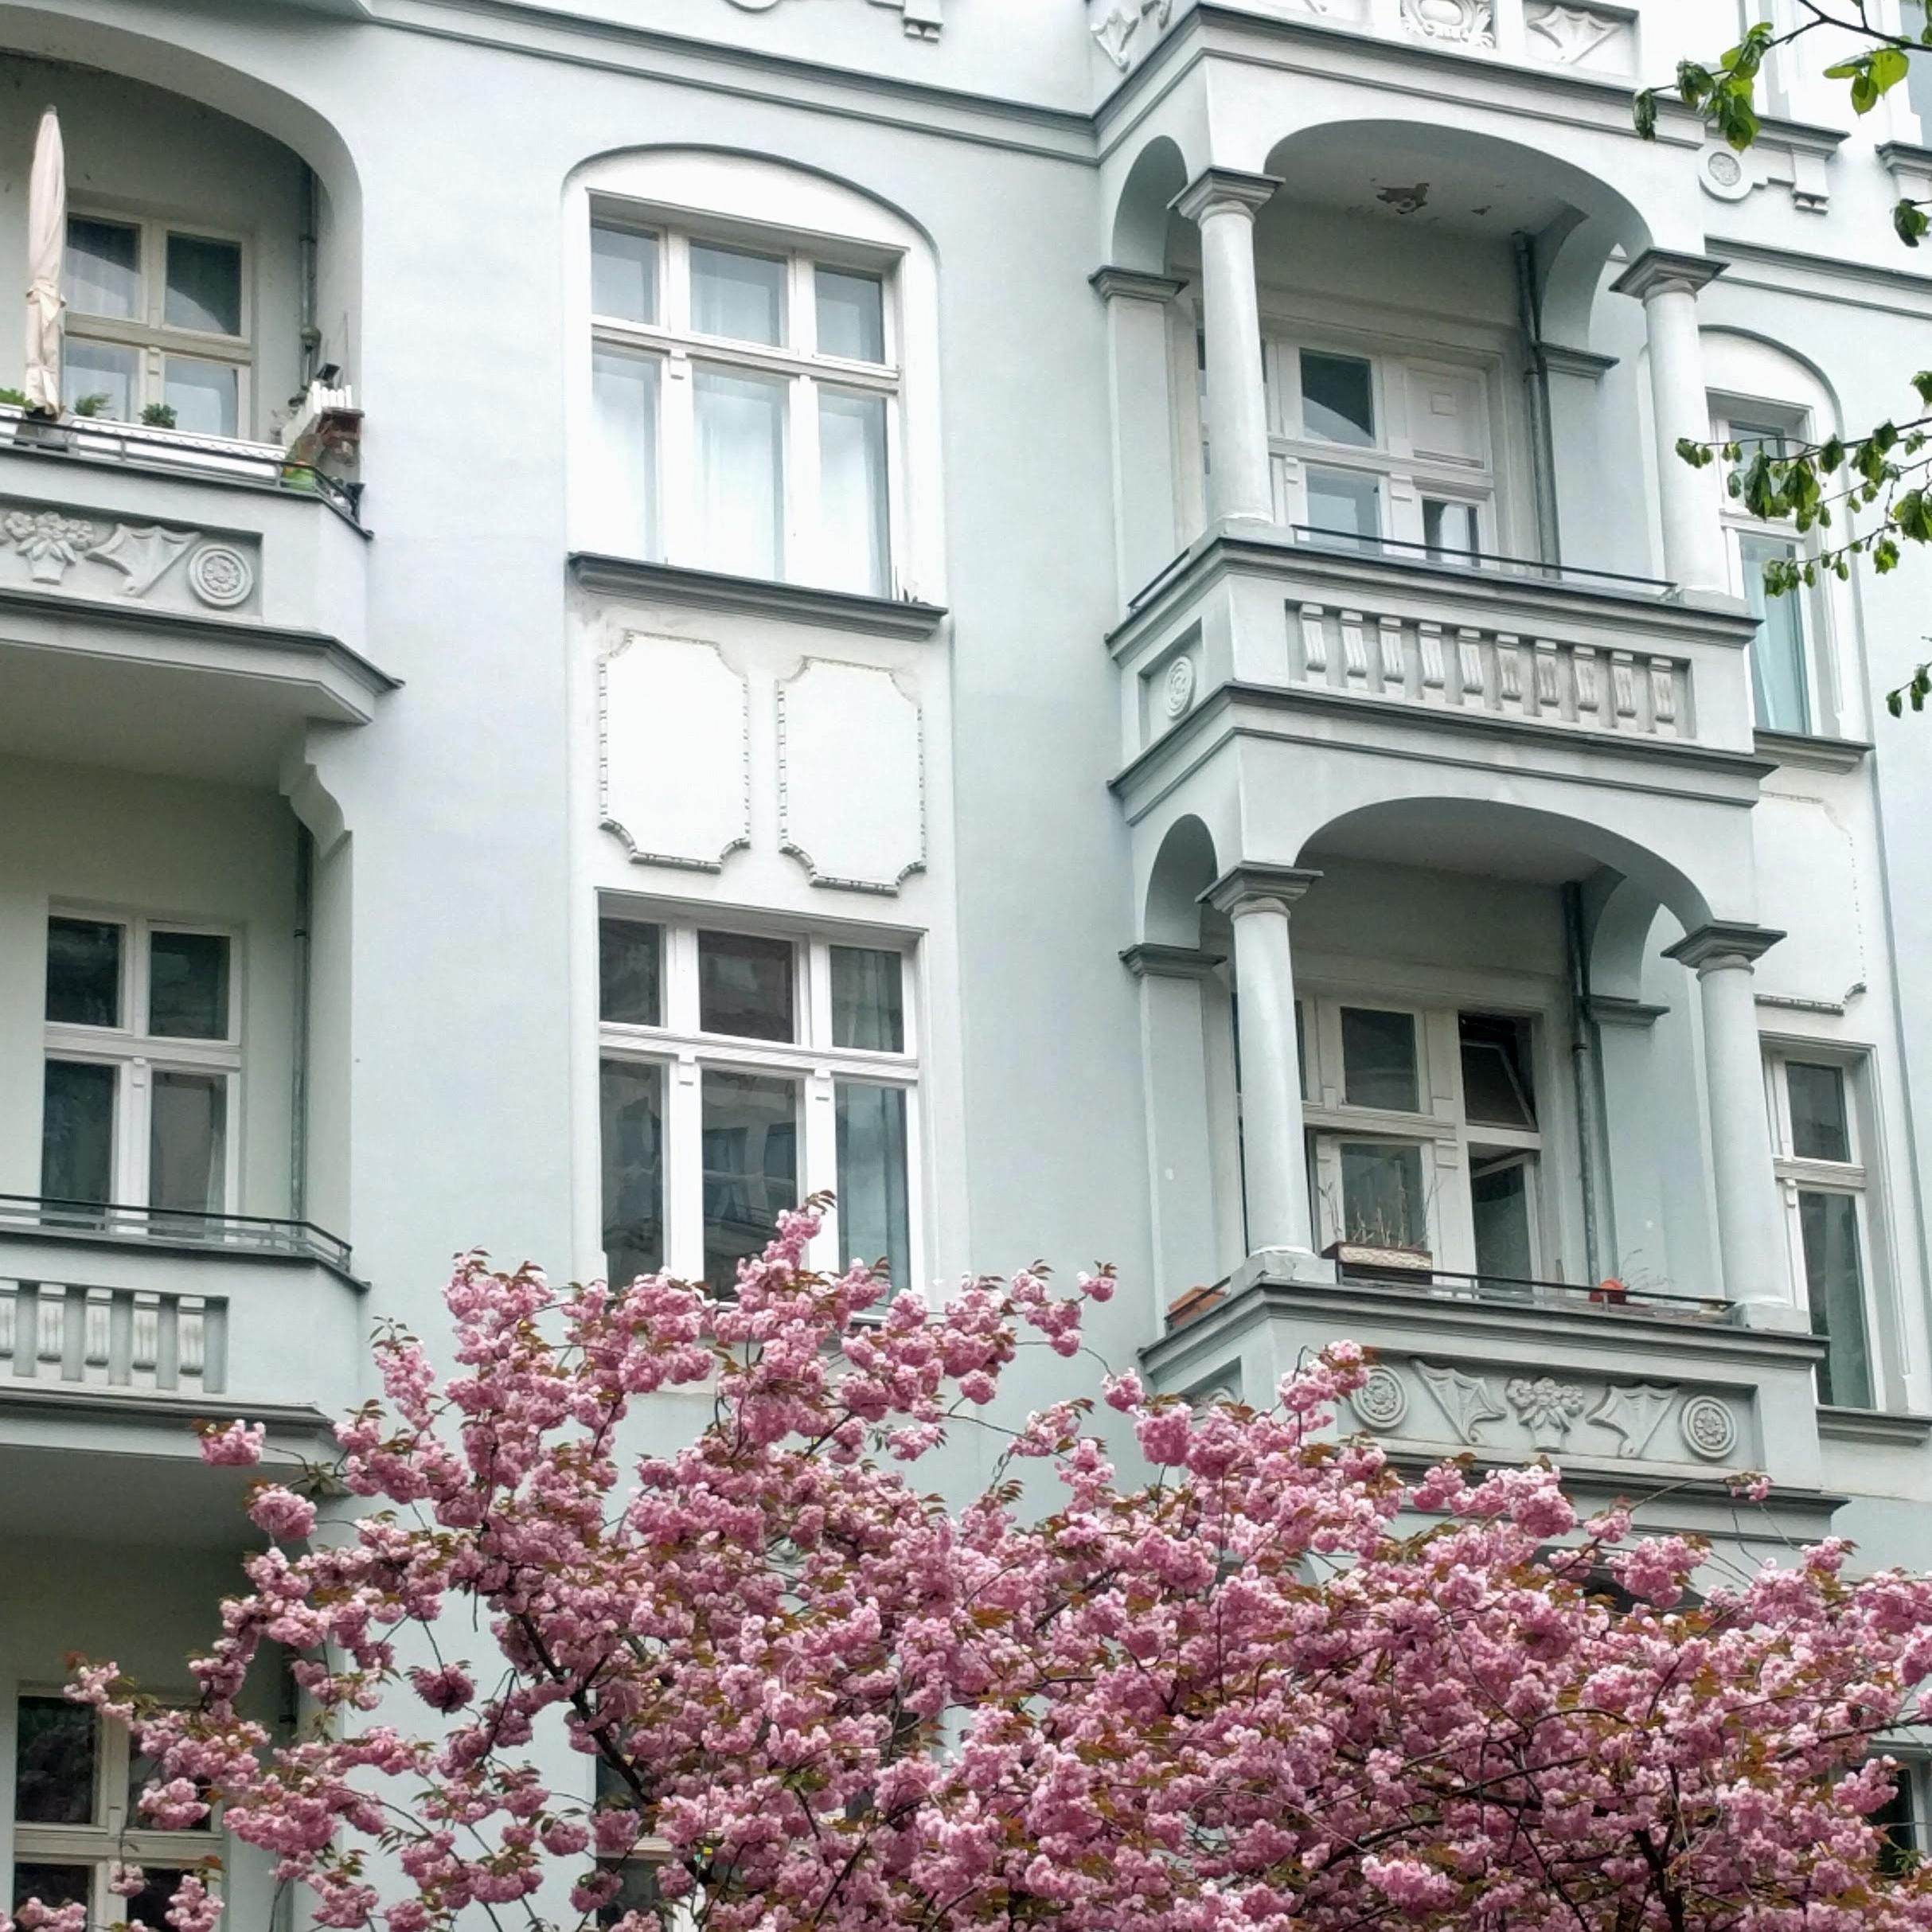 Cherry blossoms on RaumerStraße Prenzlauer Berg Berlin Germany